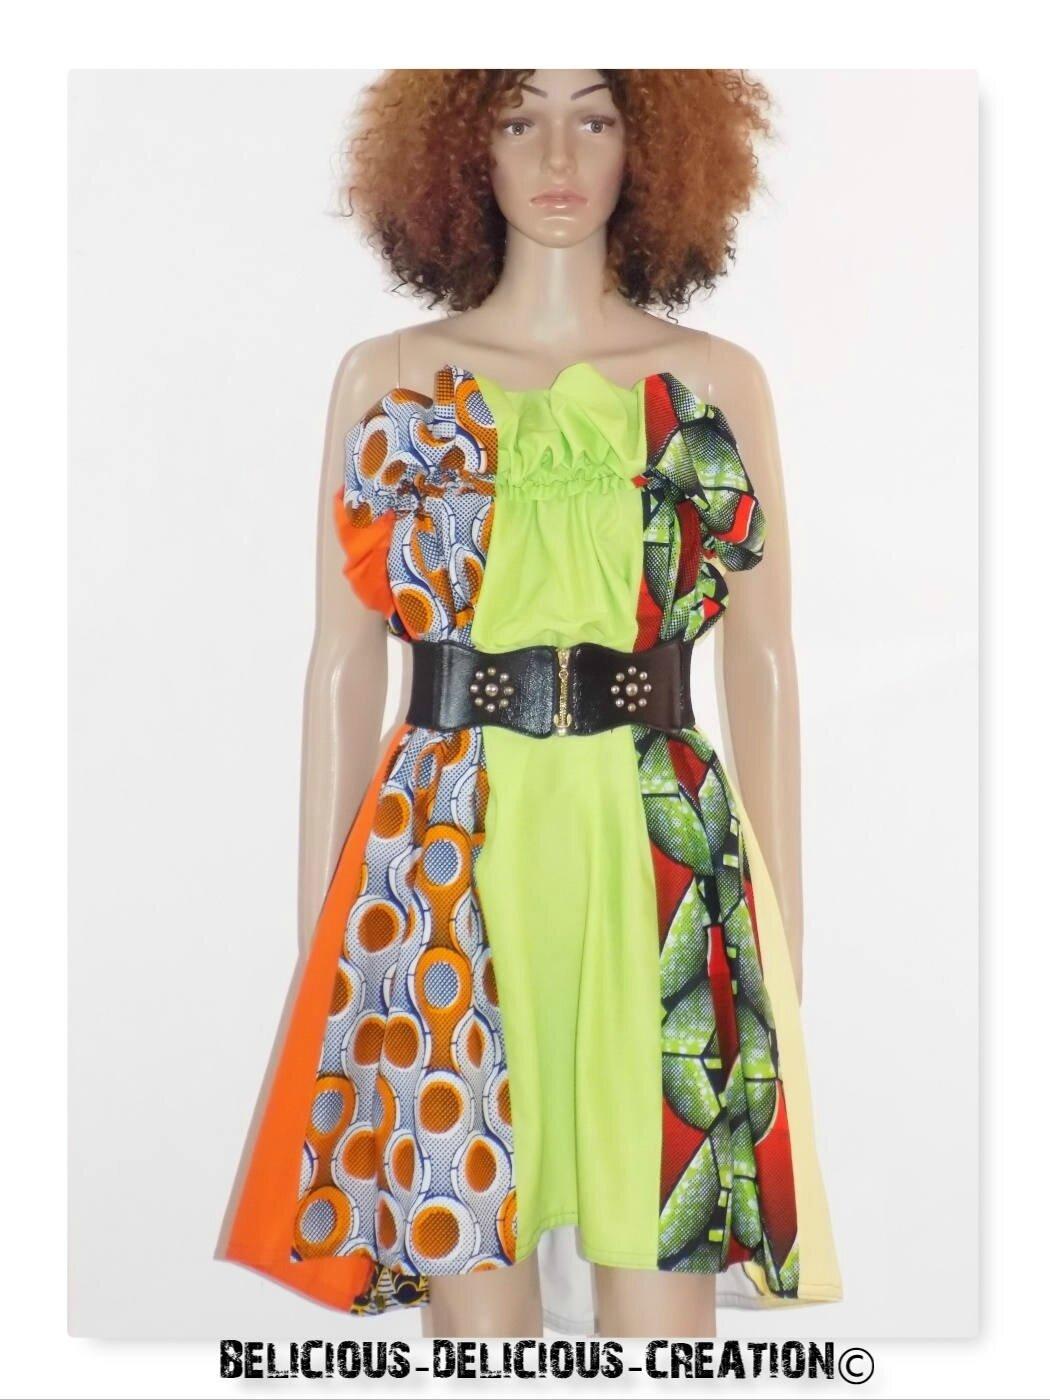 Originale Robe !! APPLEWAX !! En coton vert et multicolore Taille 38/40 Long 82cm belicious-delicious-creation